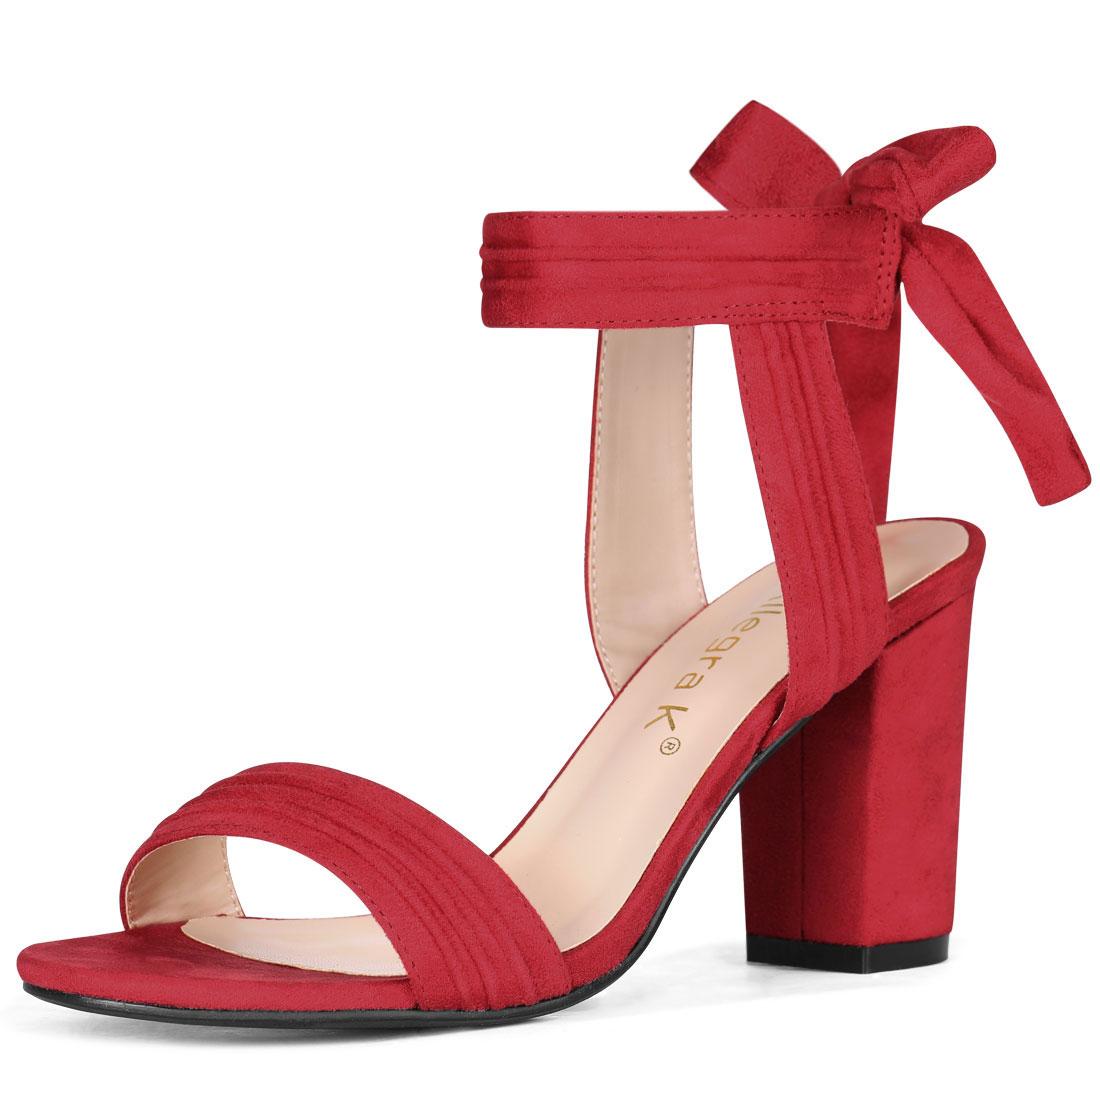 Allegra K Women's Open Toe Ankle Tie Back Chunky Heel Sandals Red US 11